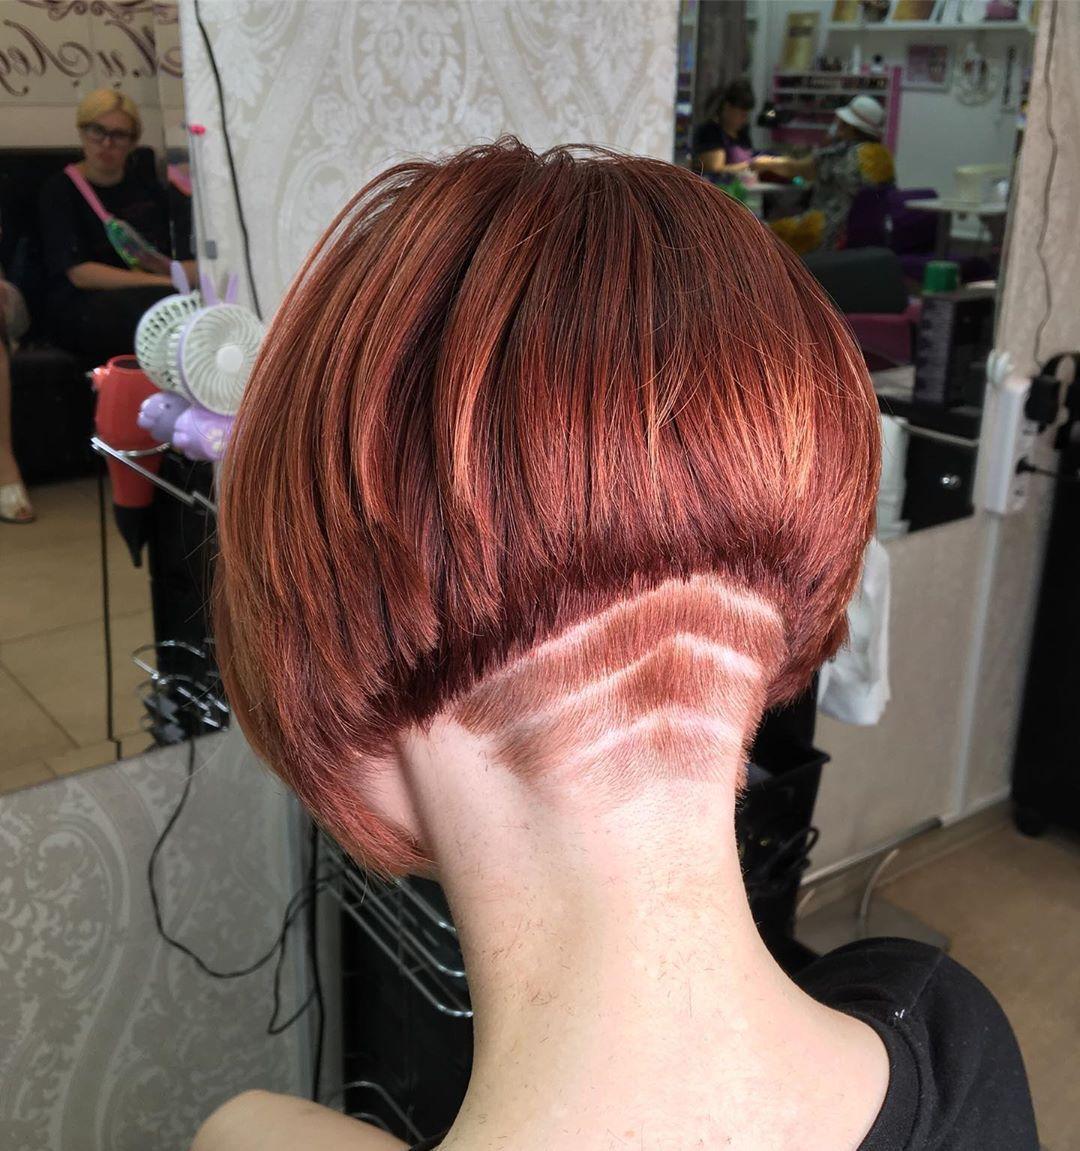 #hairdare #bob #undercut #napebuzz #angledbob #bobhaircut